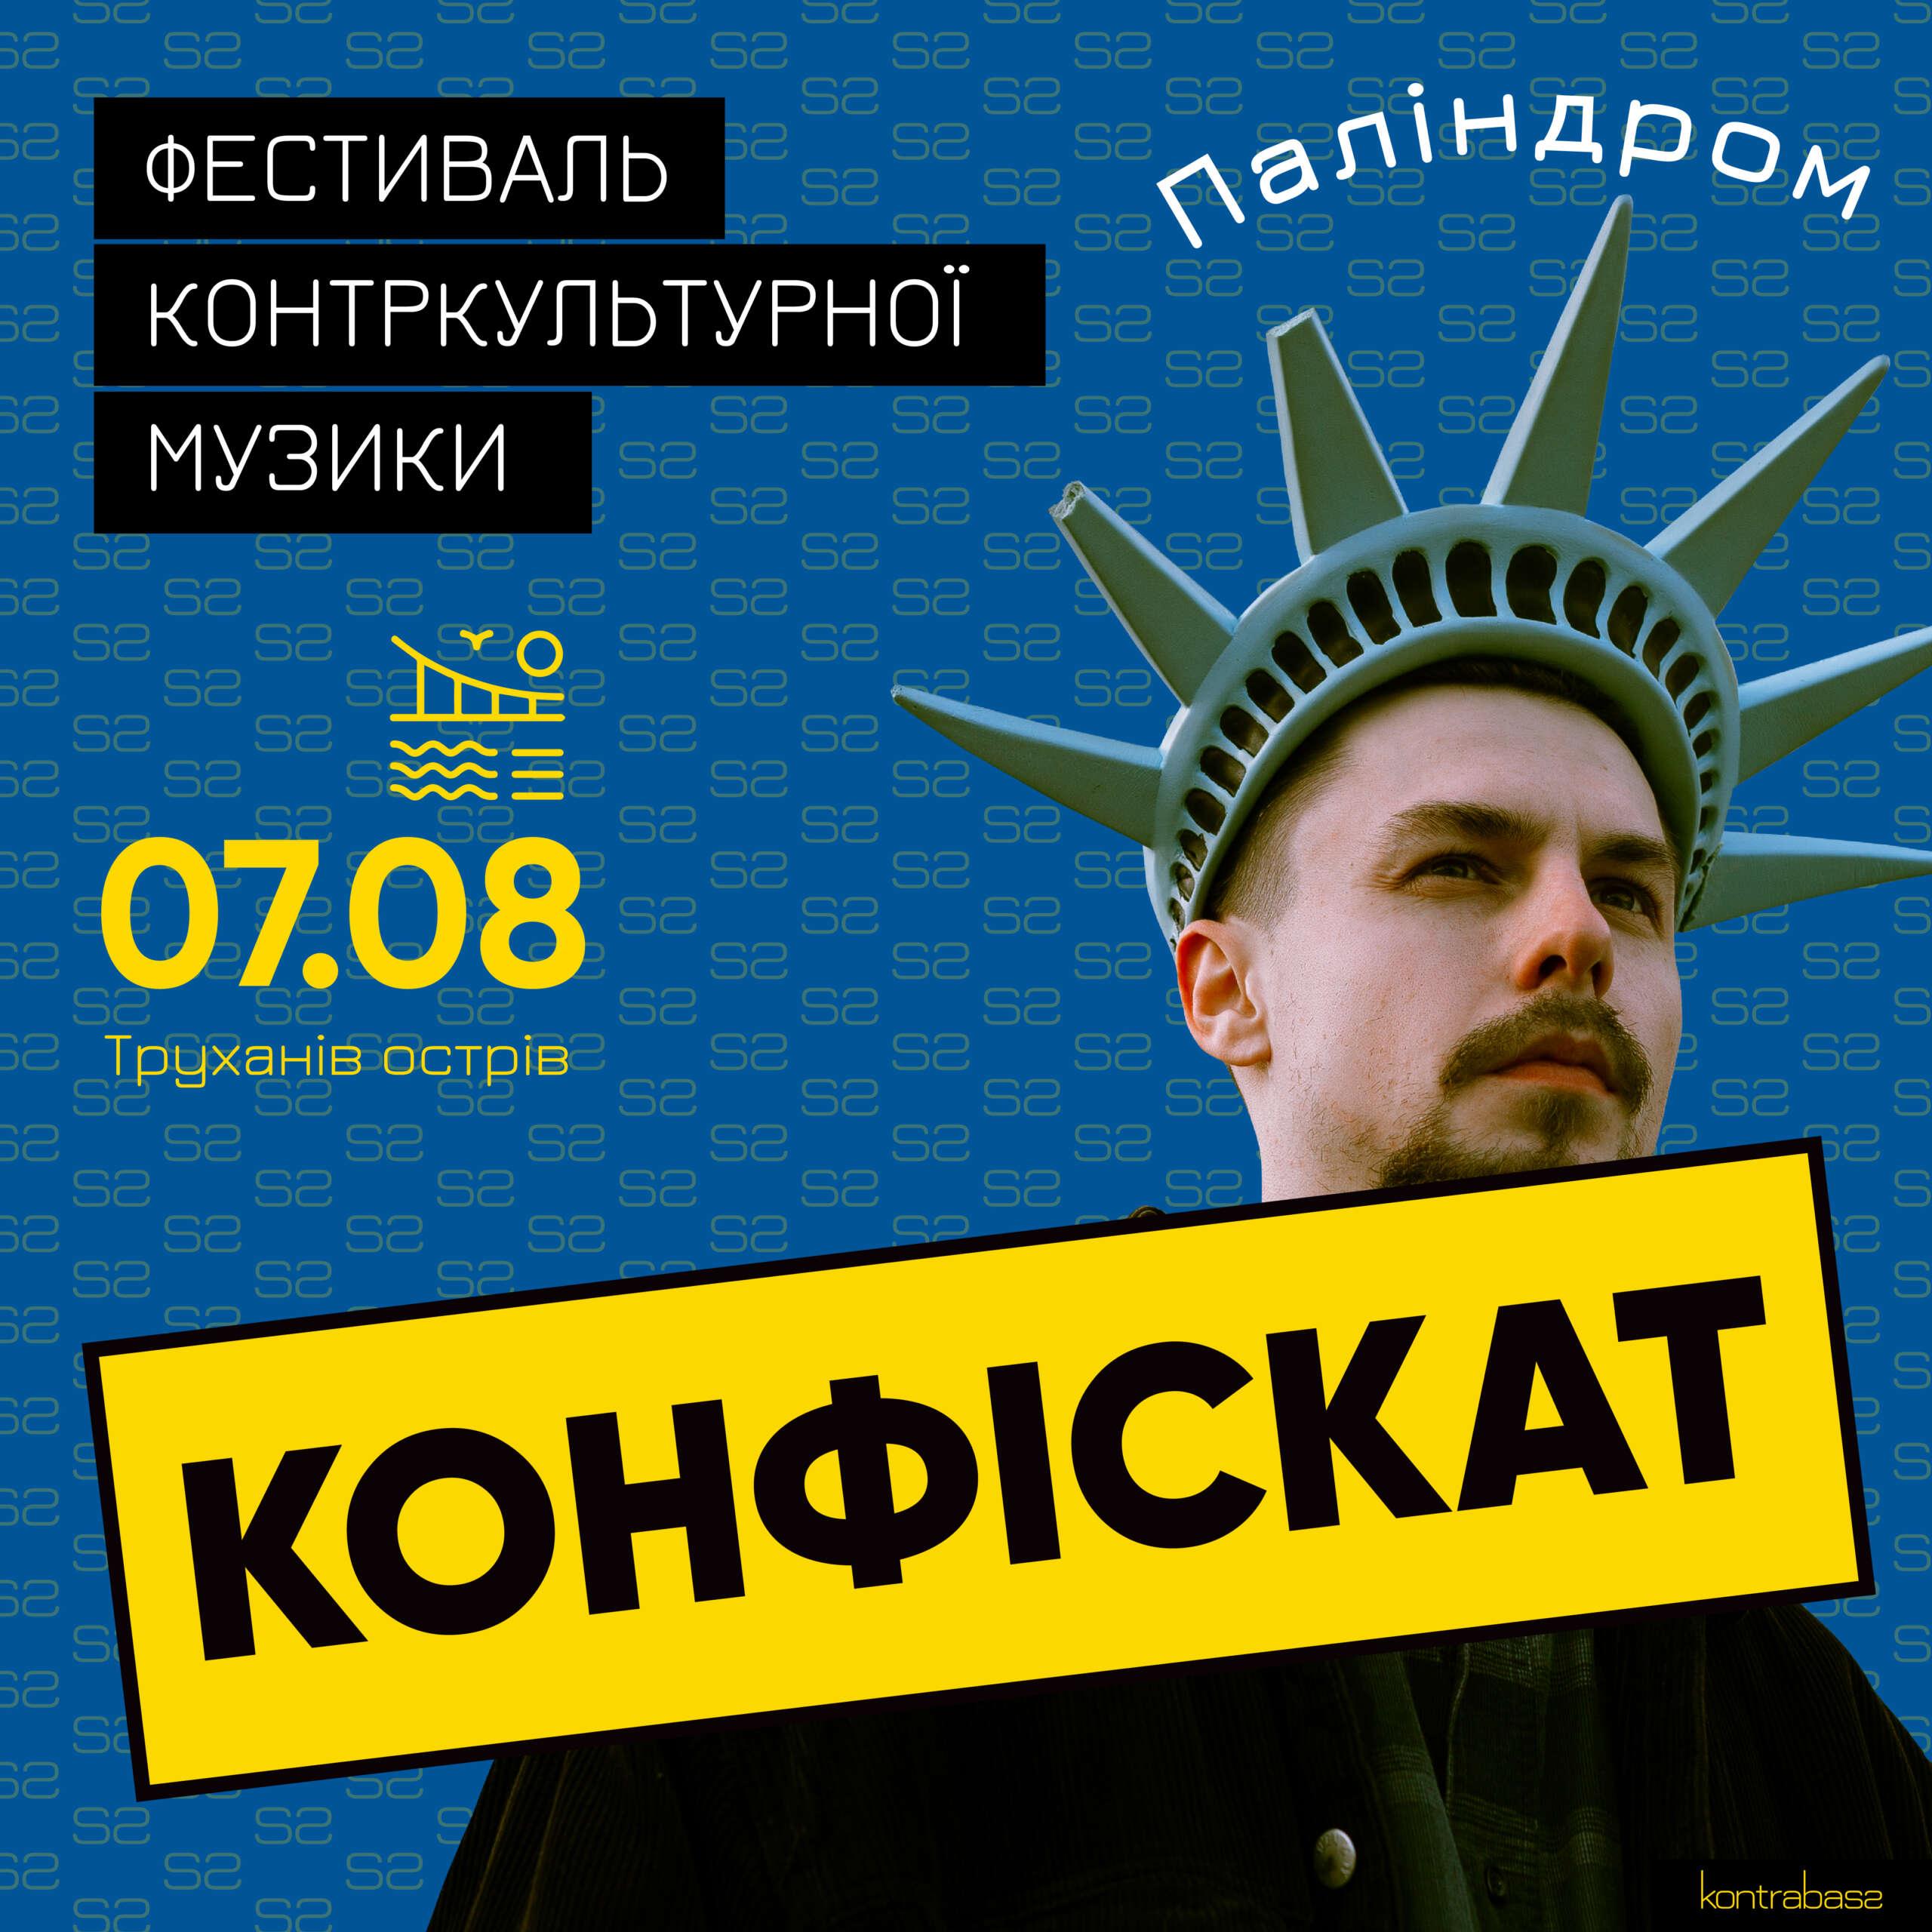 konfiskat-dtf-magazine1